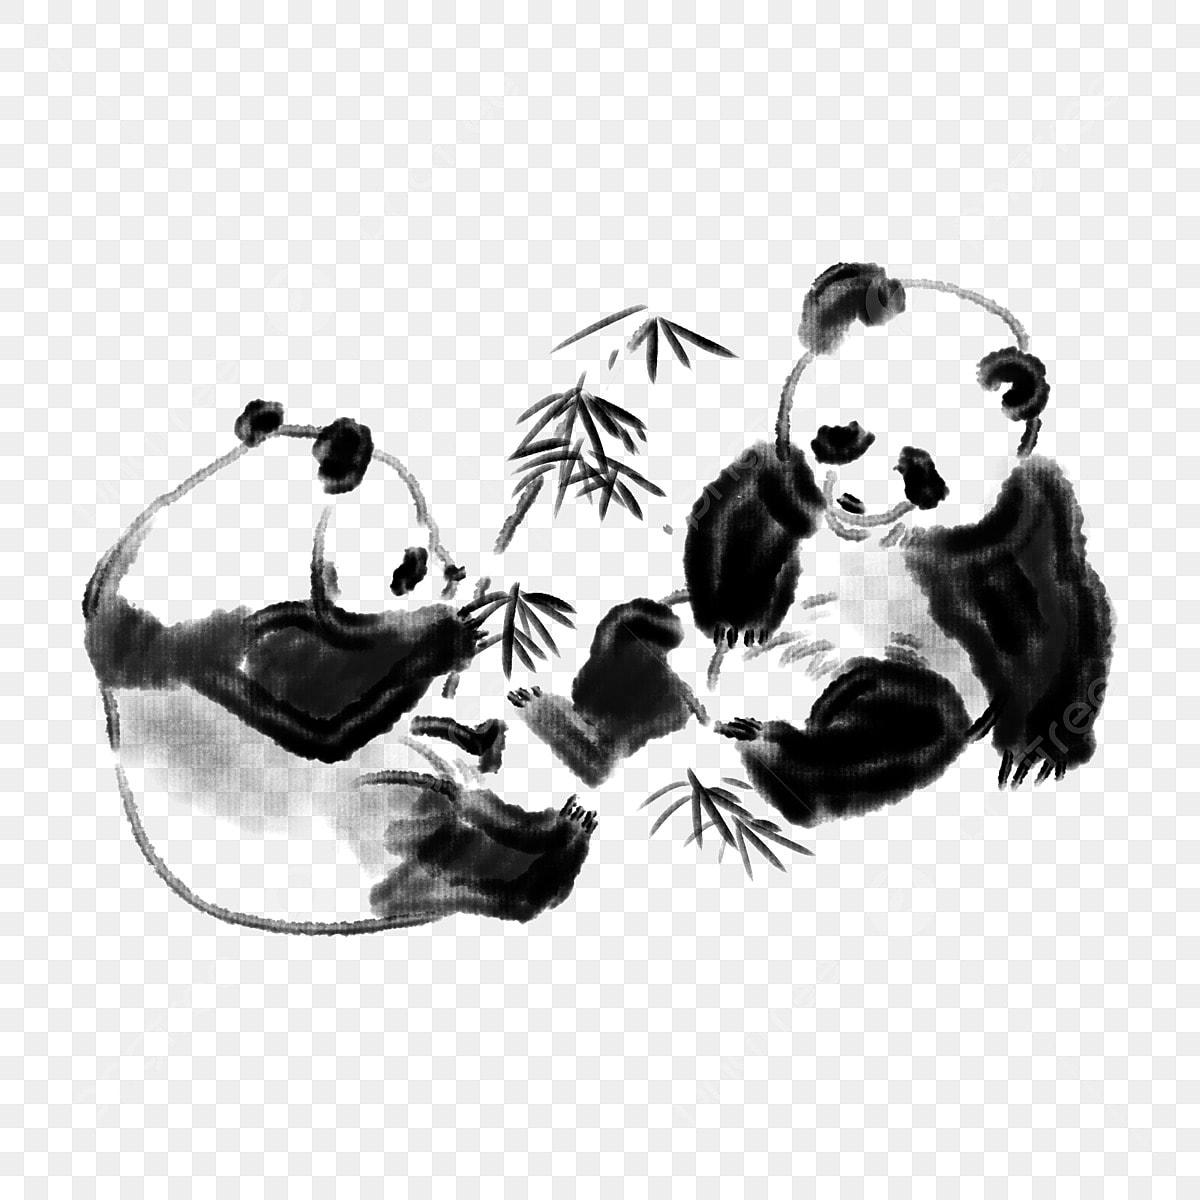 Joli Dessin Panda Panda Animal Dessin Fichier Png Et Psd